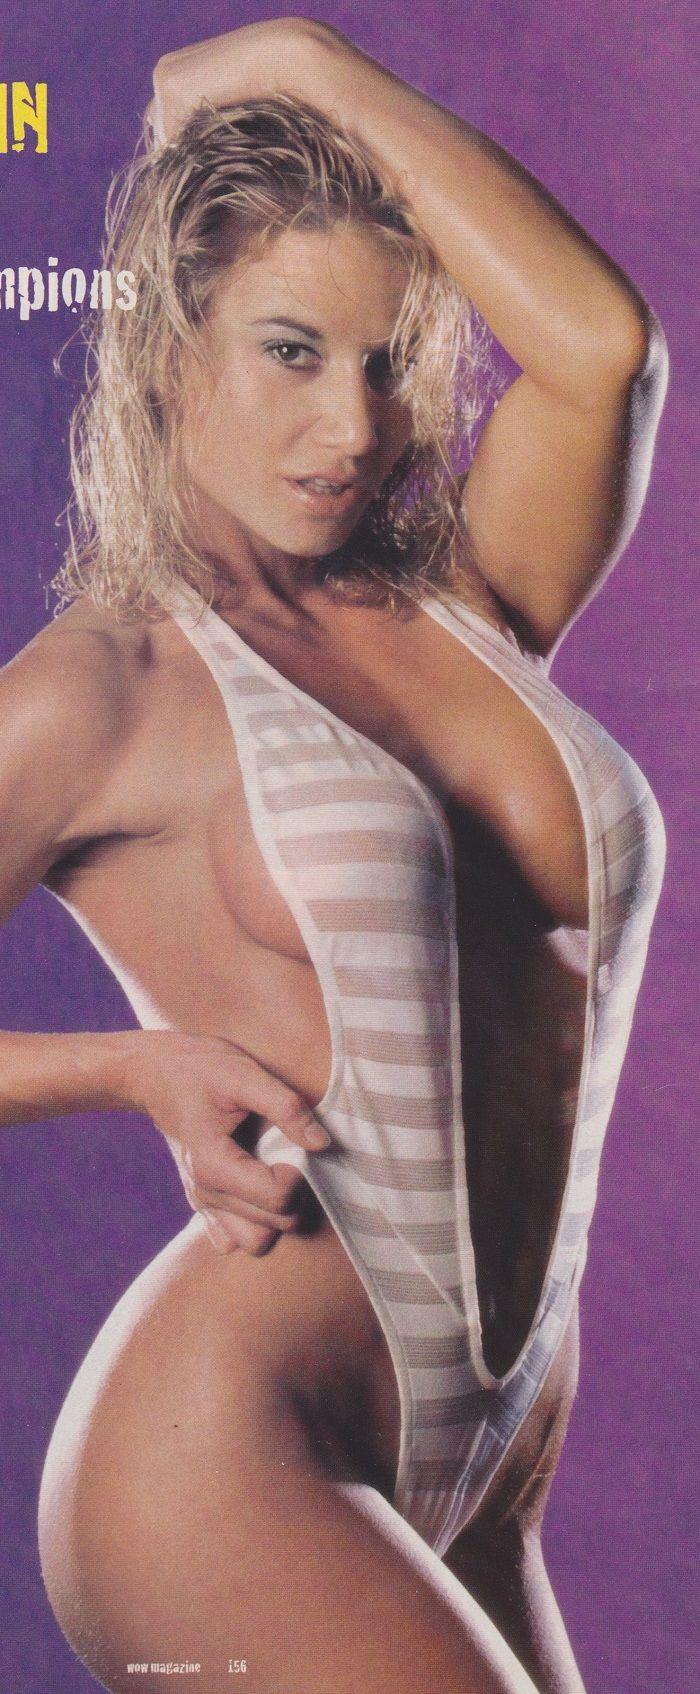 Celebrites Tamara Lynn Sytch nudes (99 photos), Pussy, Paparazzi, Instagram, in bikini 2017